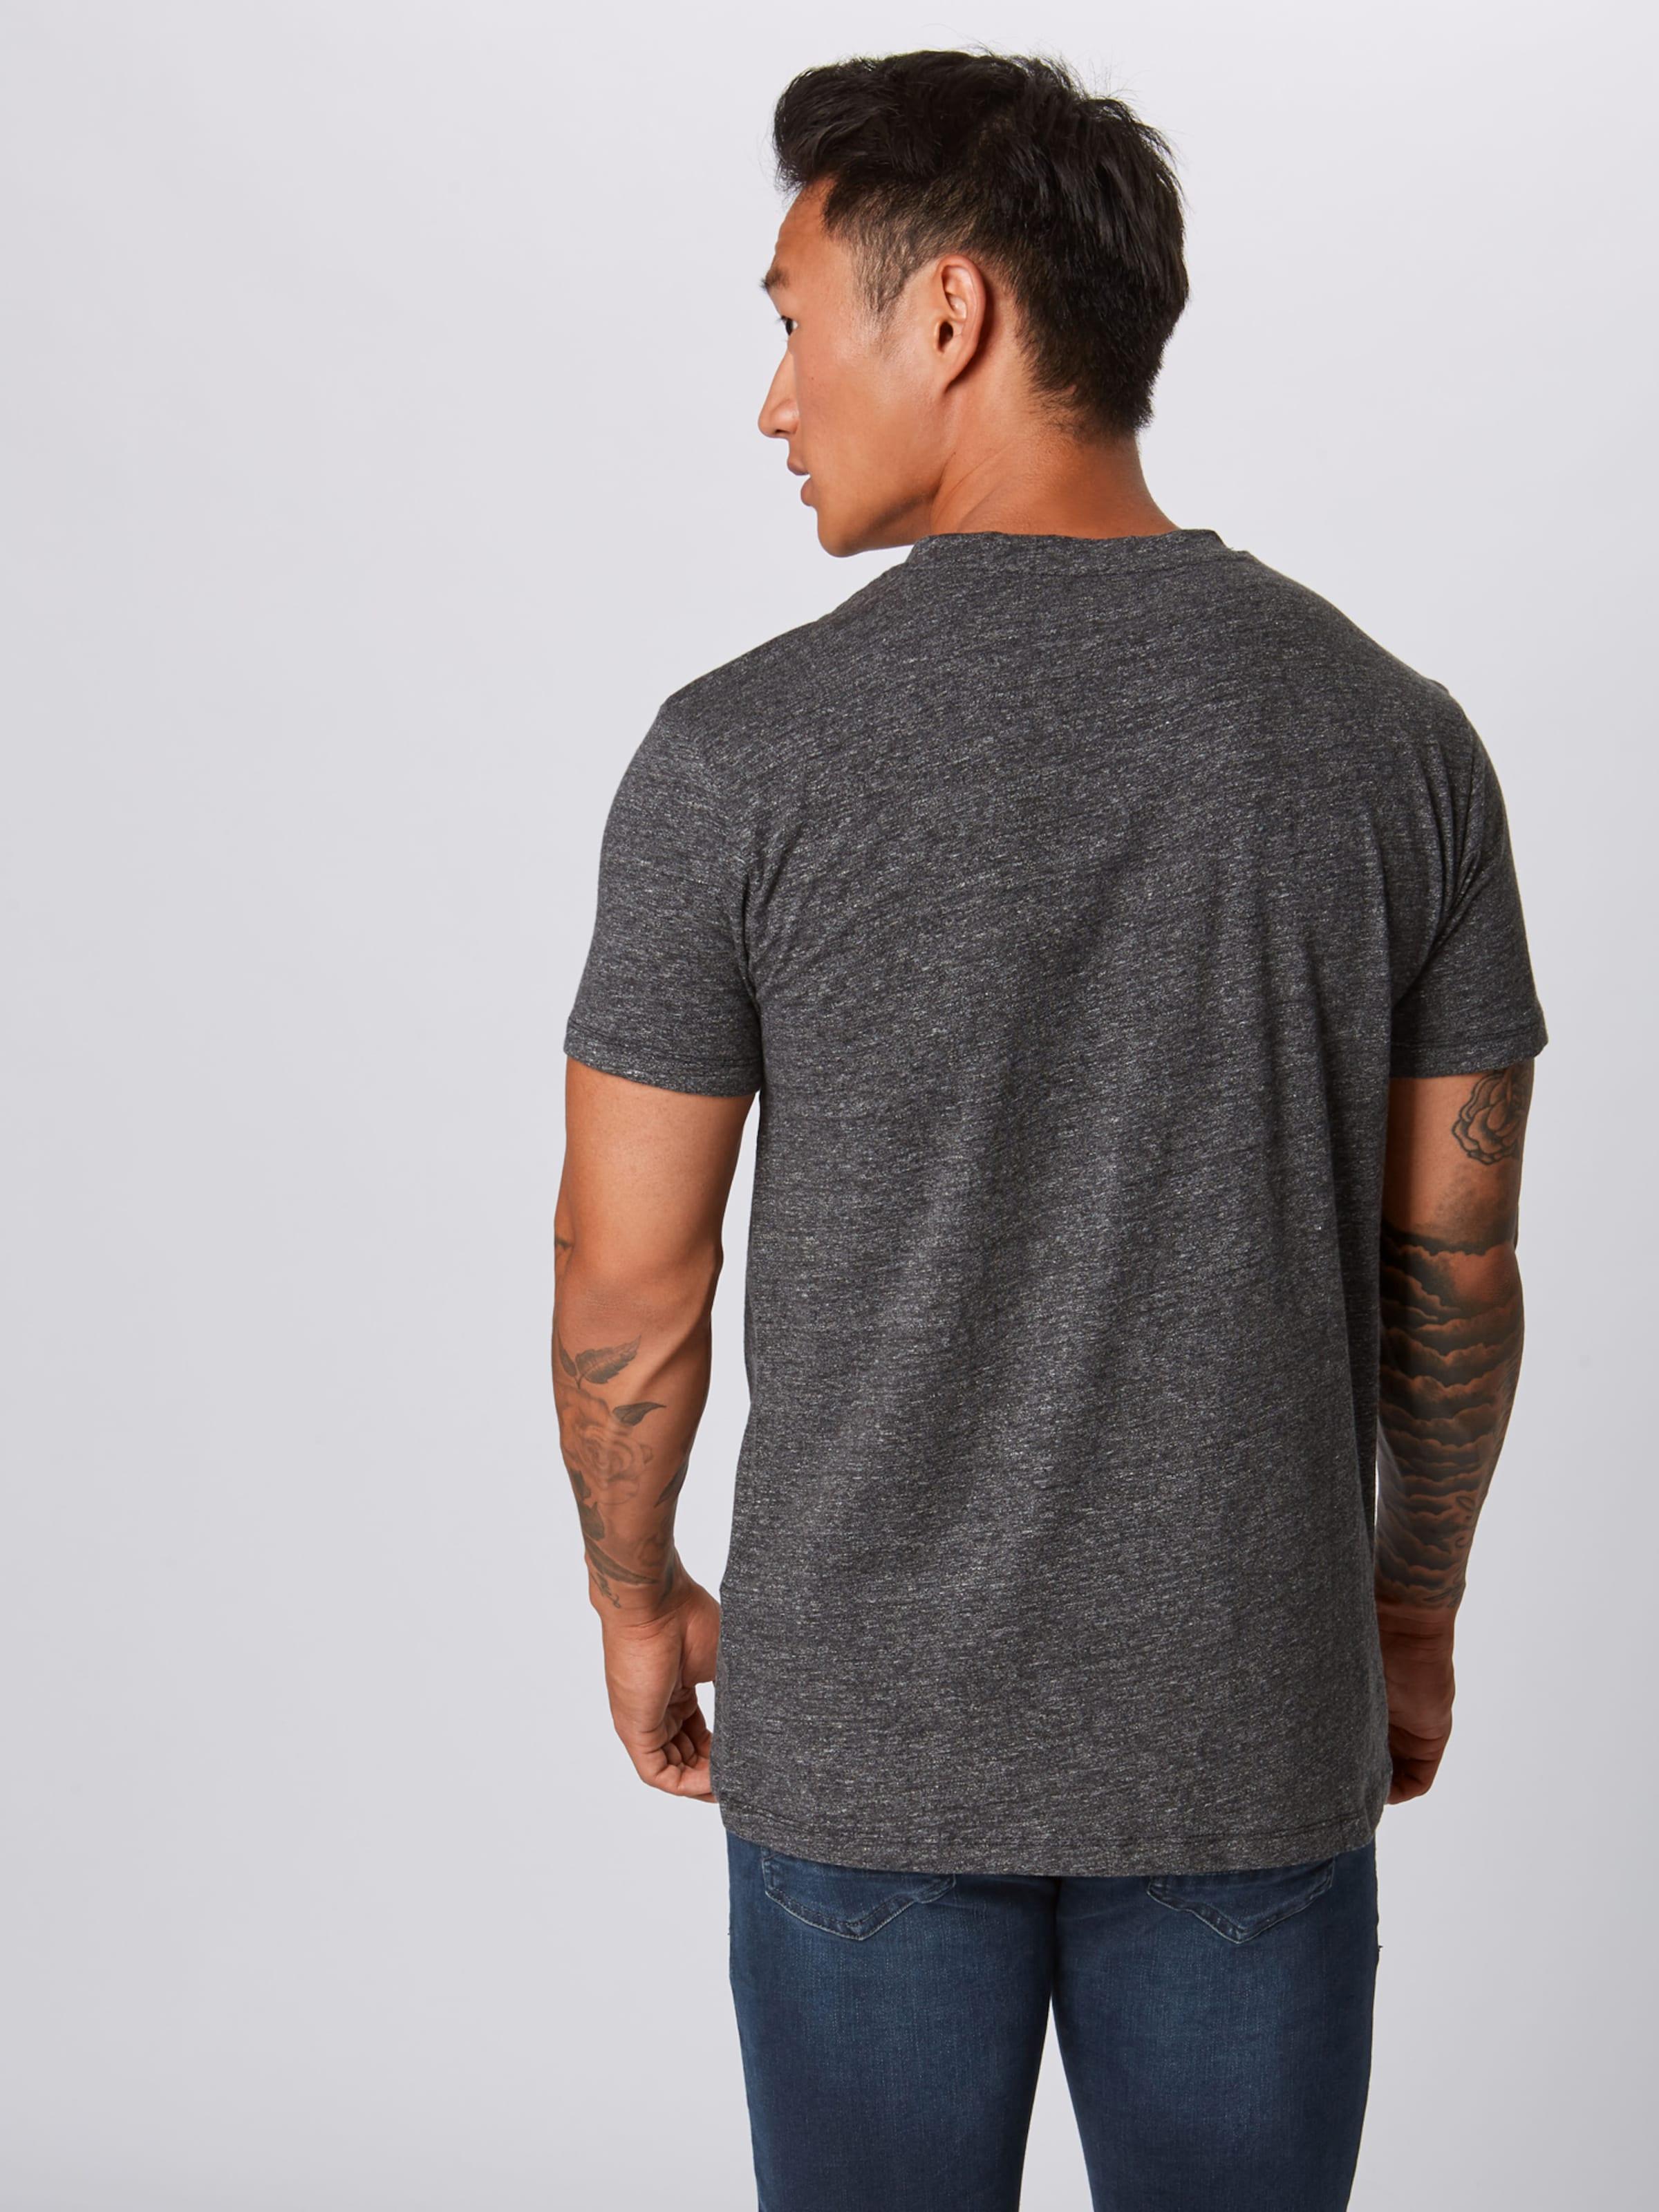 Pocket' Sapin Lee En shirt 'ultimate T XOk8n0wP